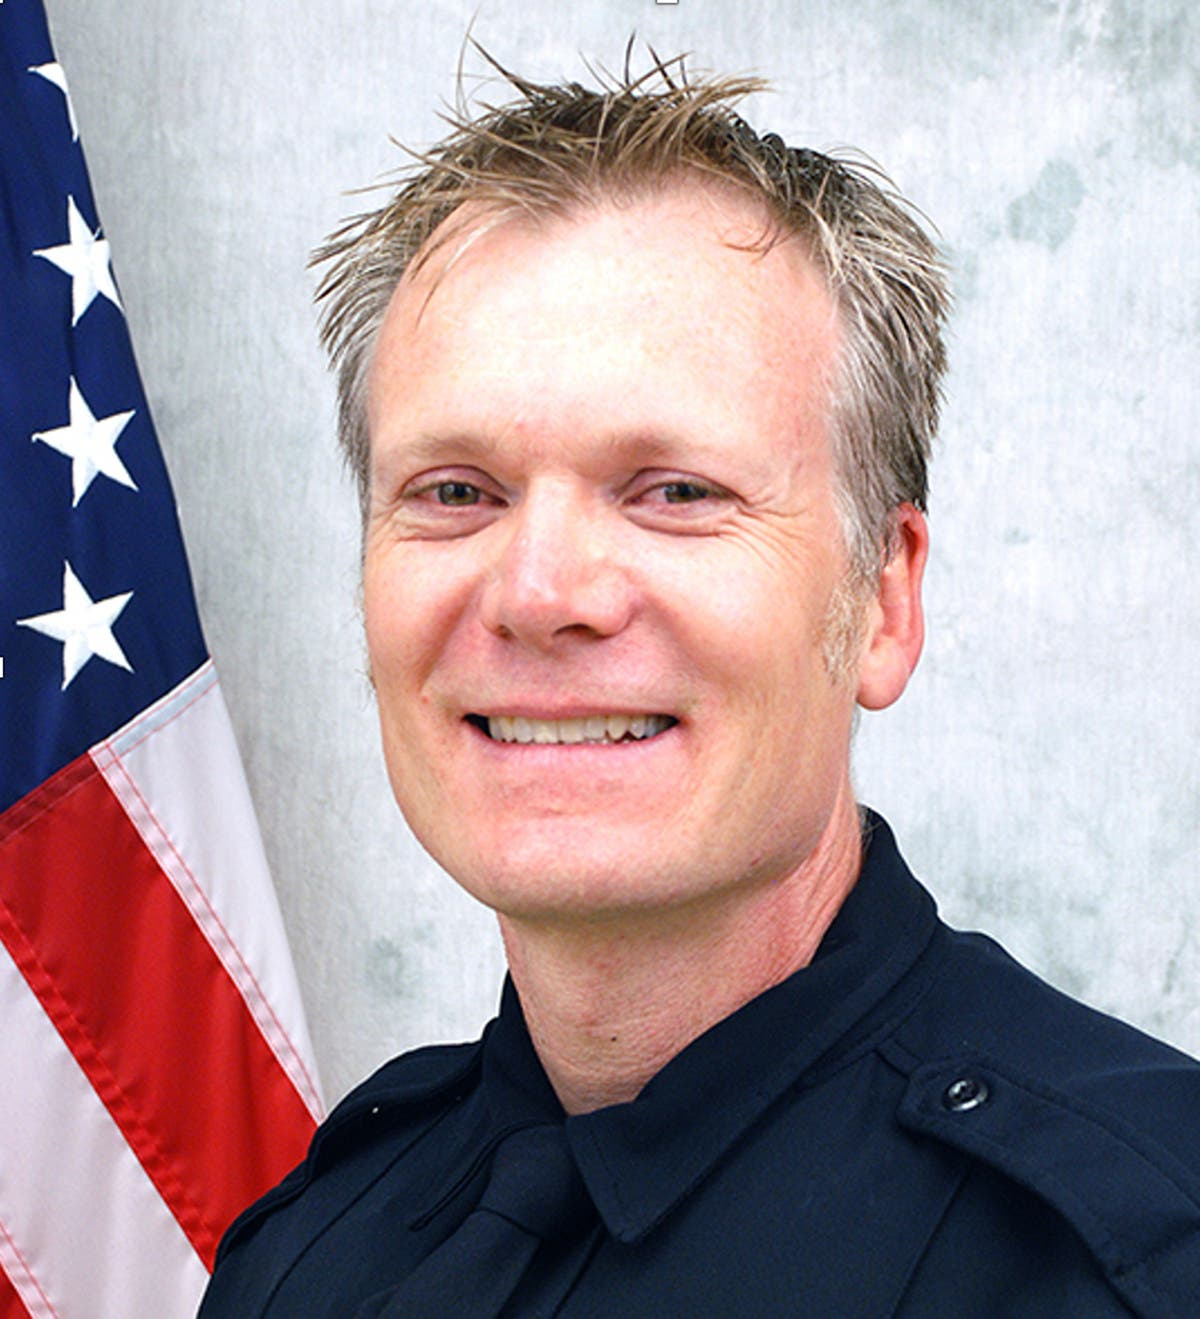 Chef: Slain Colorado officer had 'fundamental goodness'